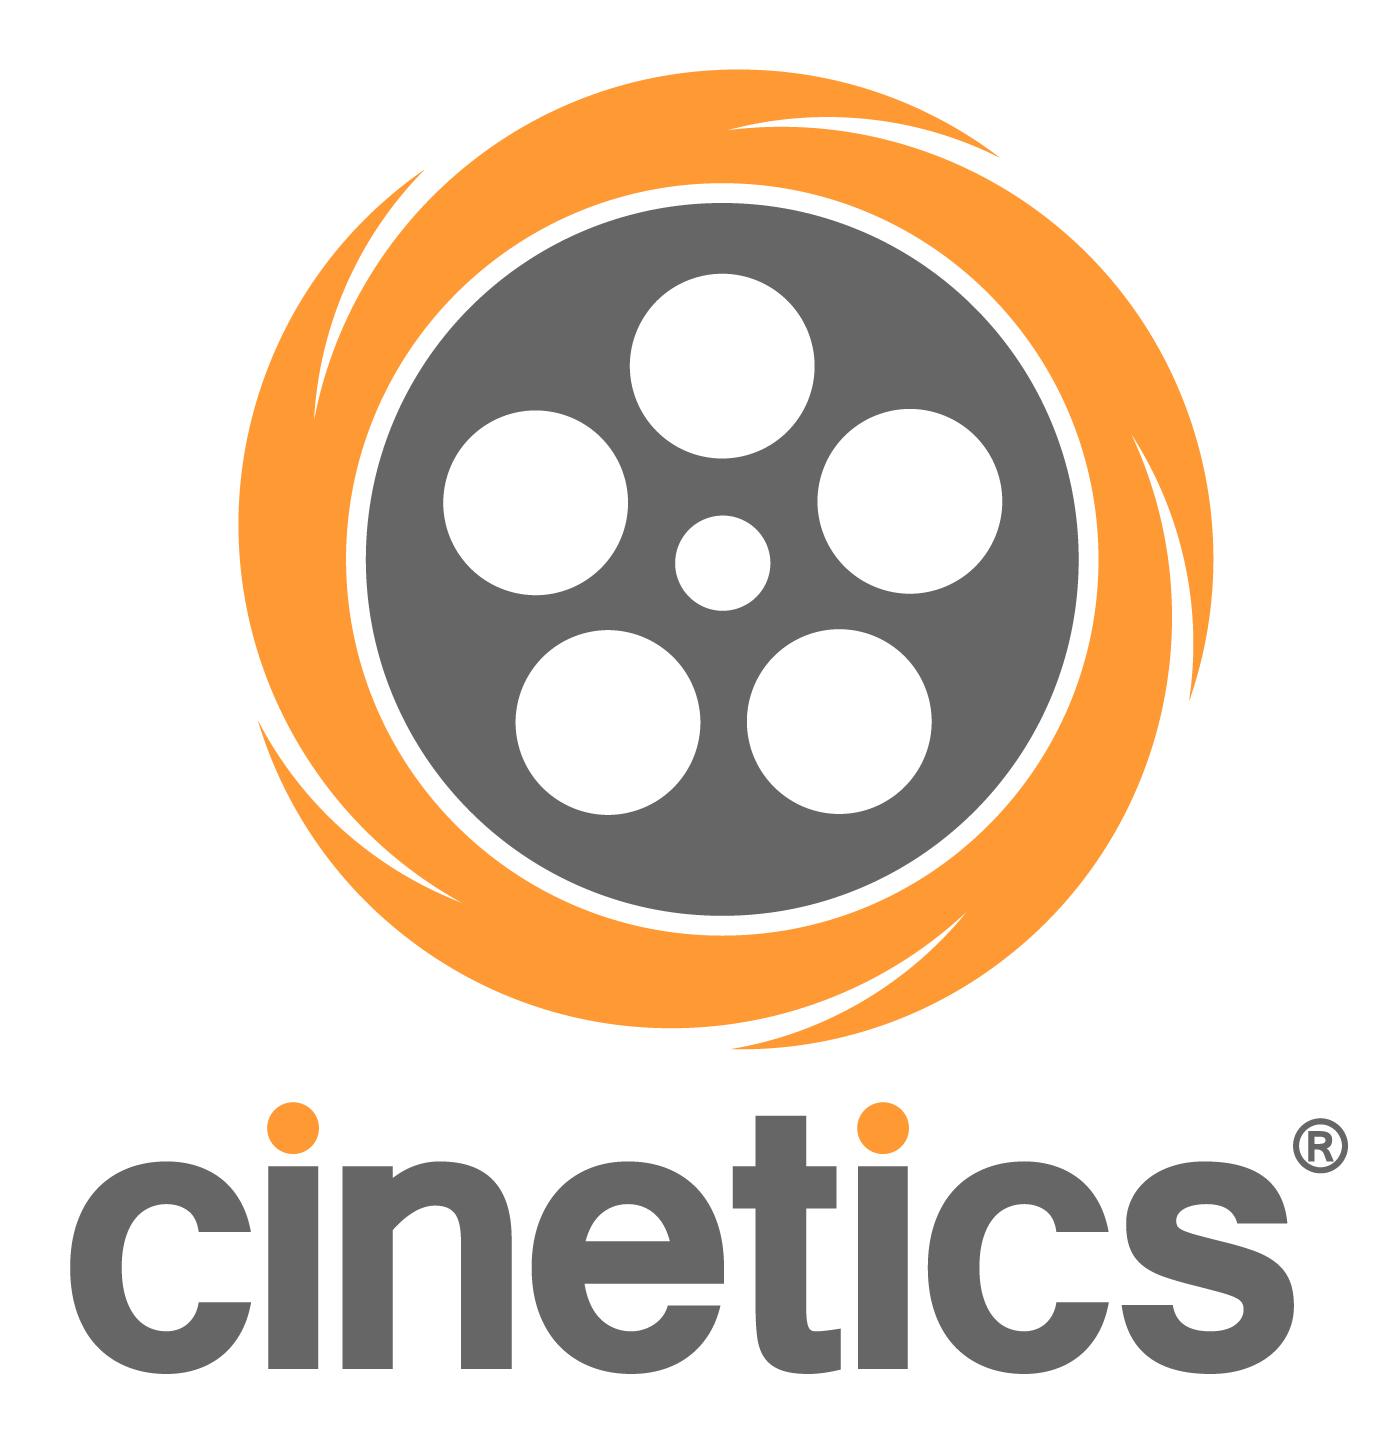 CineticsOrange Logo-01.png